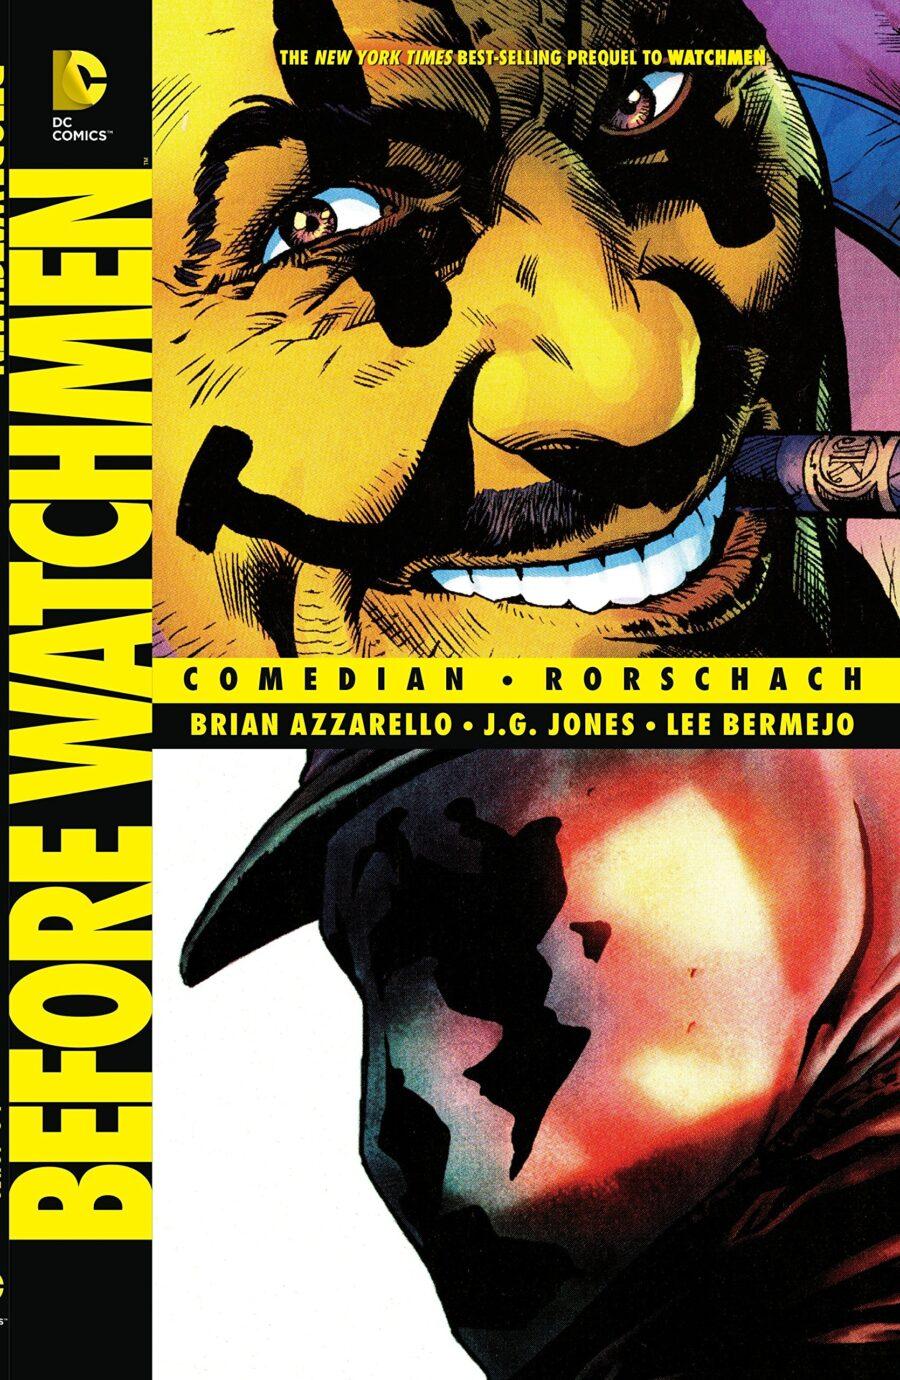 Rorschach series